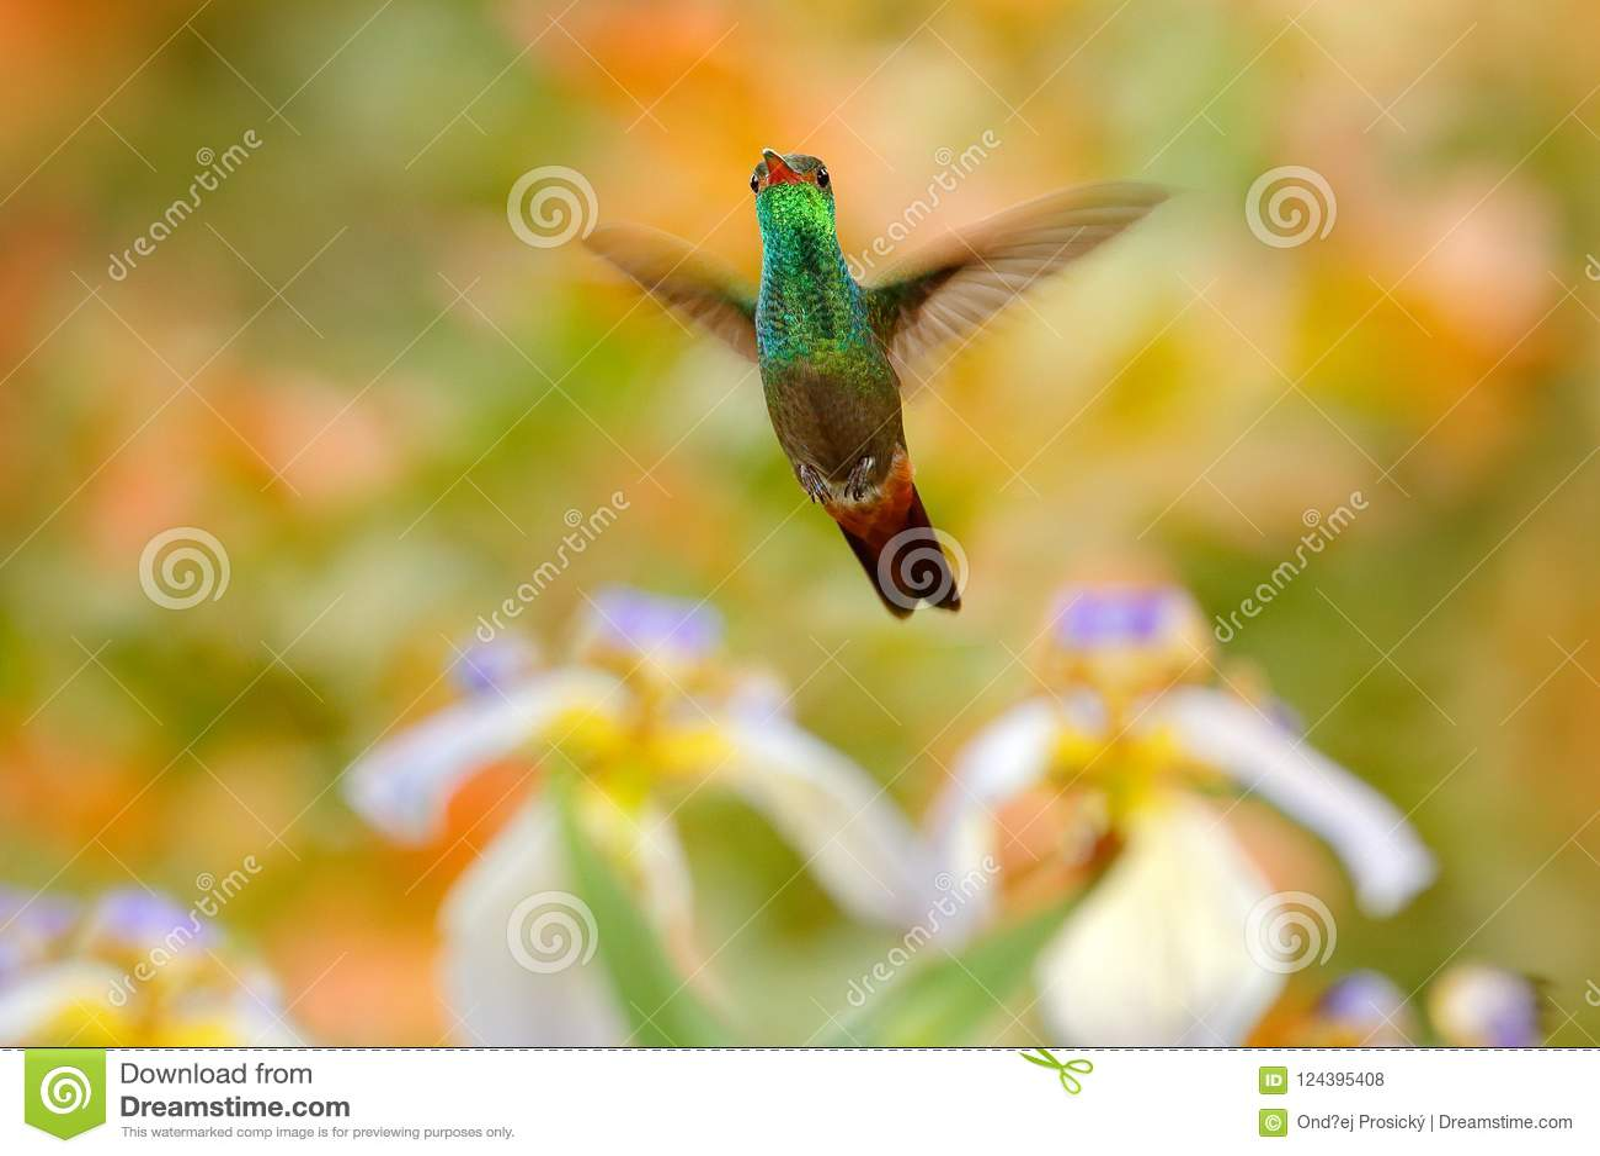 Rufous-tailed Hummingbird, Amazilia tzacatl, hummingbird with orange green flower background in Costa Rica. Bird in the nature ha